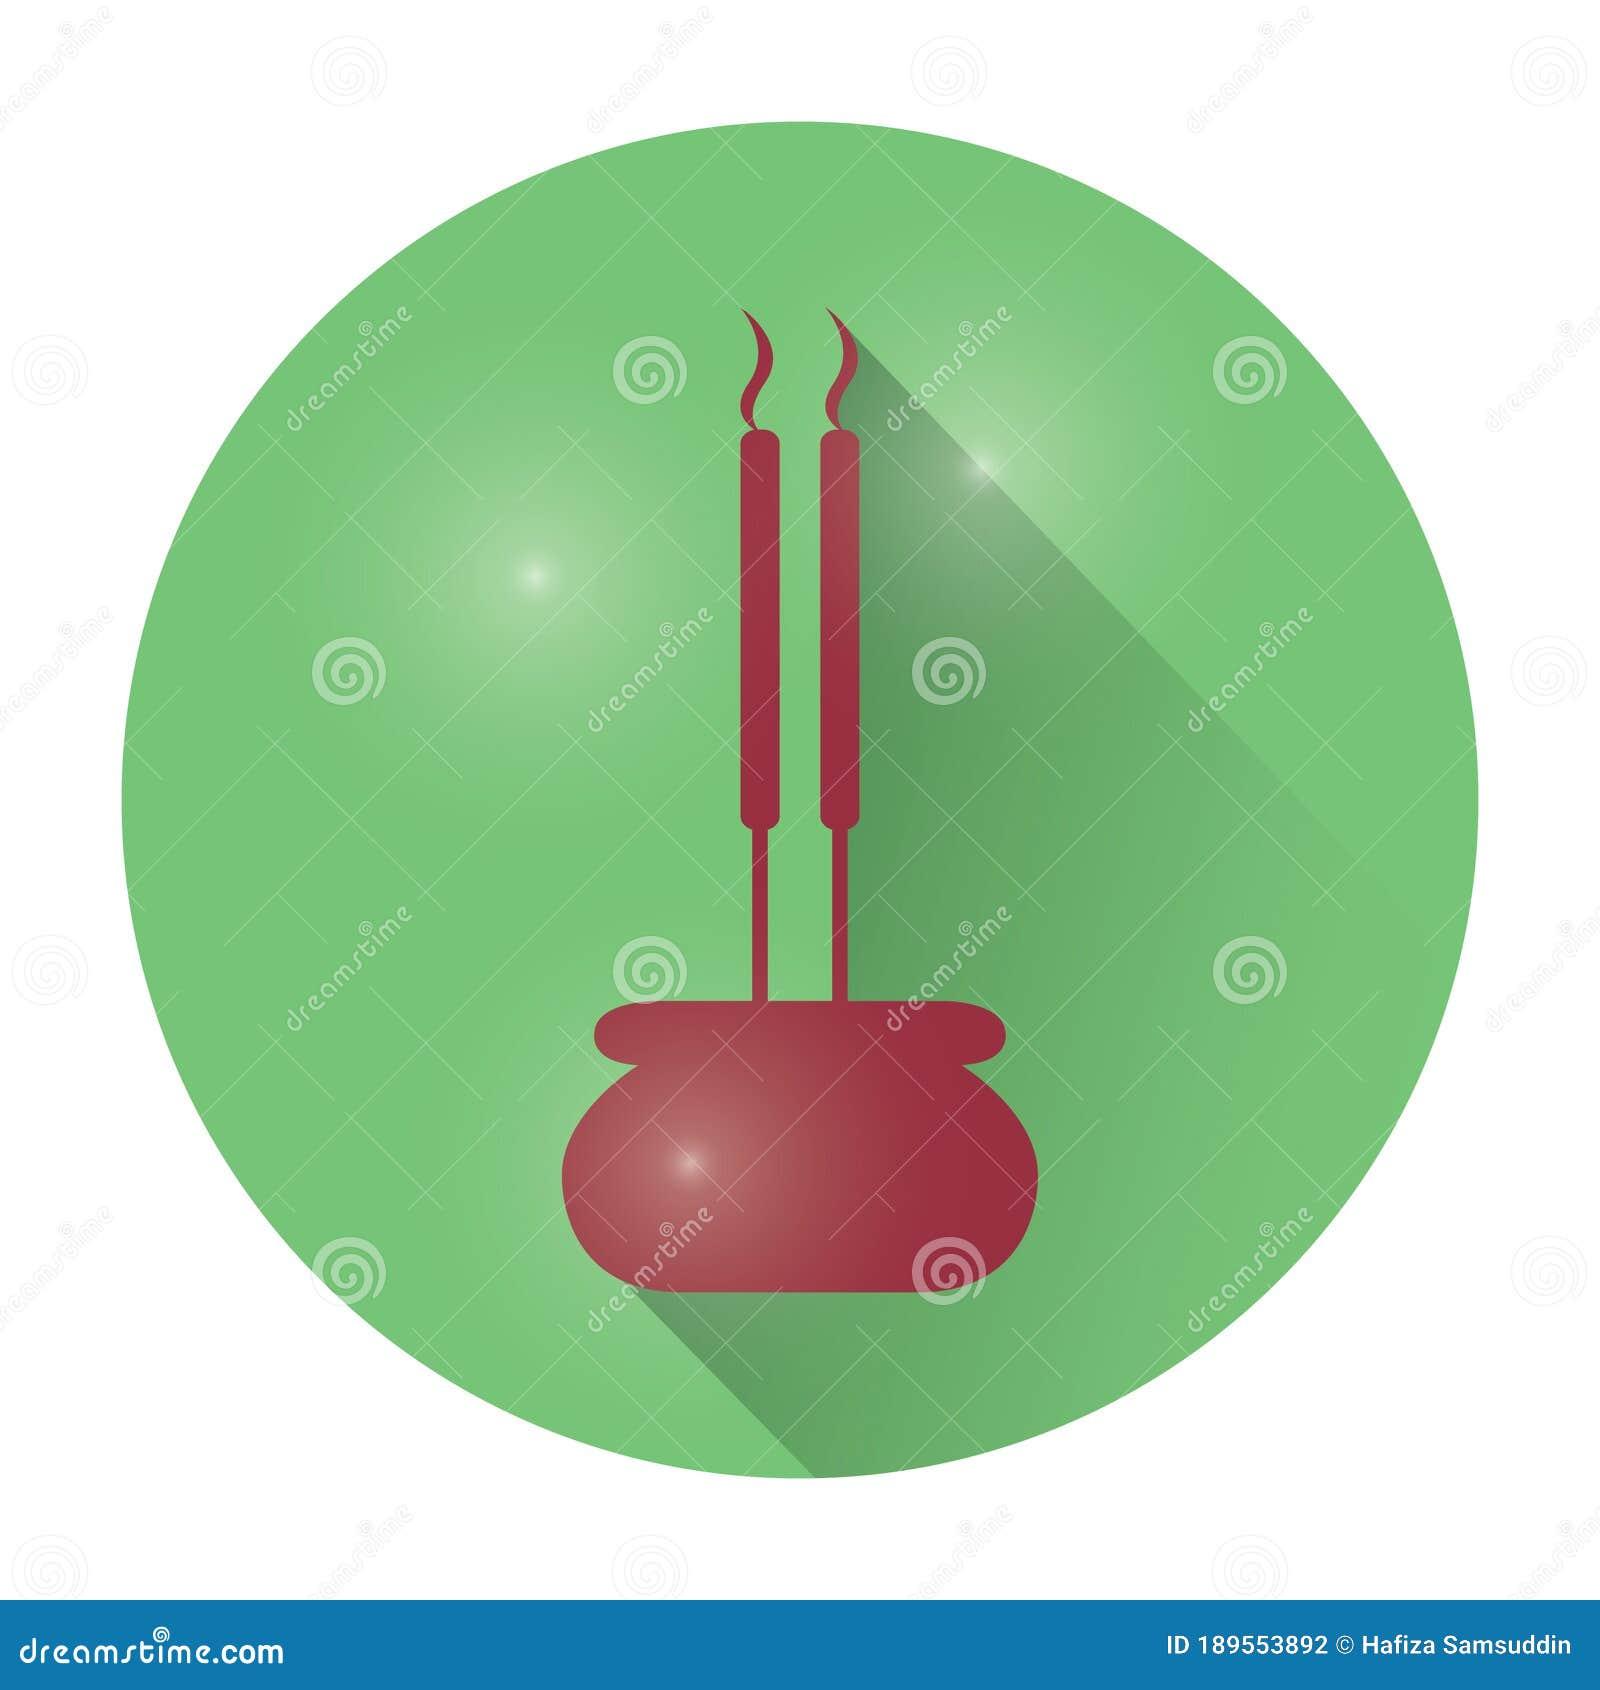 Incense Sticks Vector Illustration Decorative Design Stock Vector Illustration Of Relaxation Fragrance 189553892